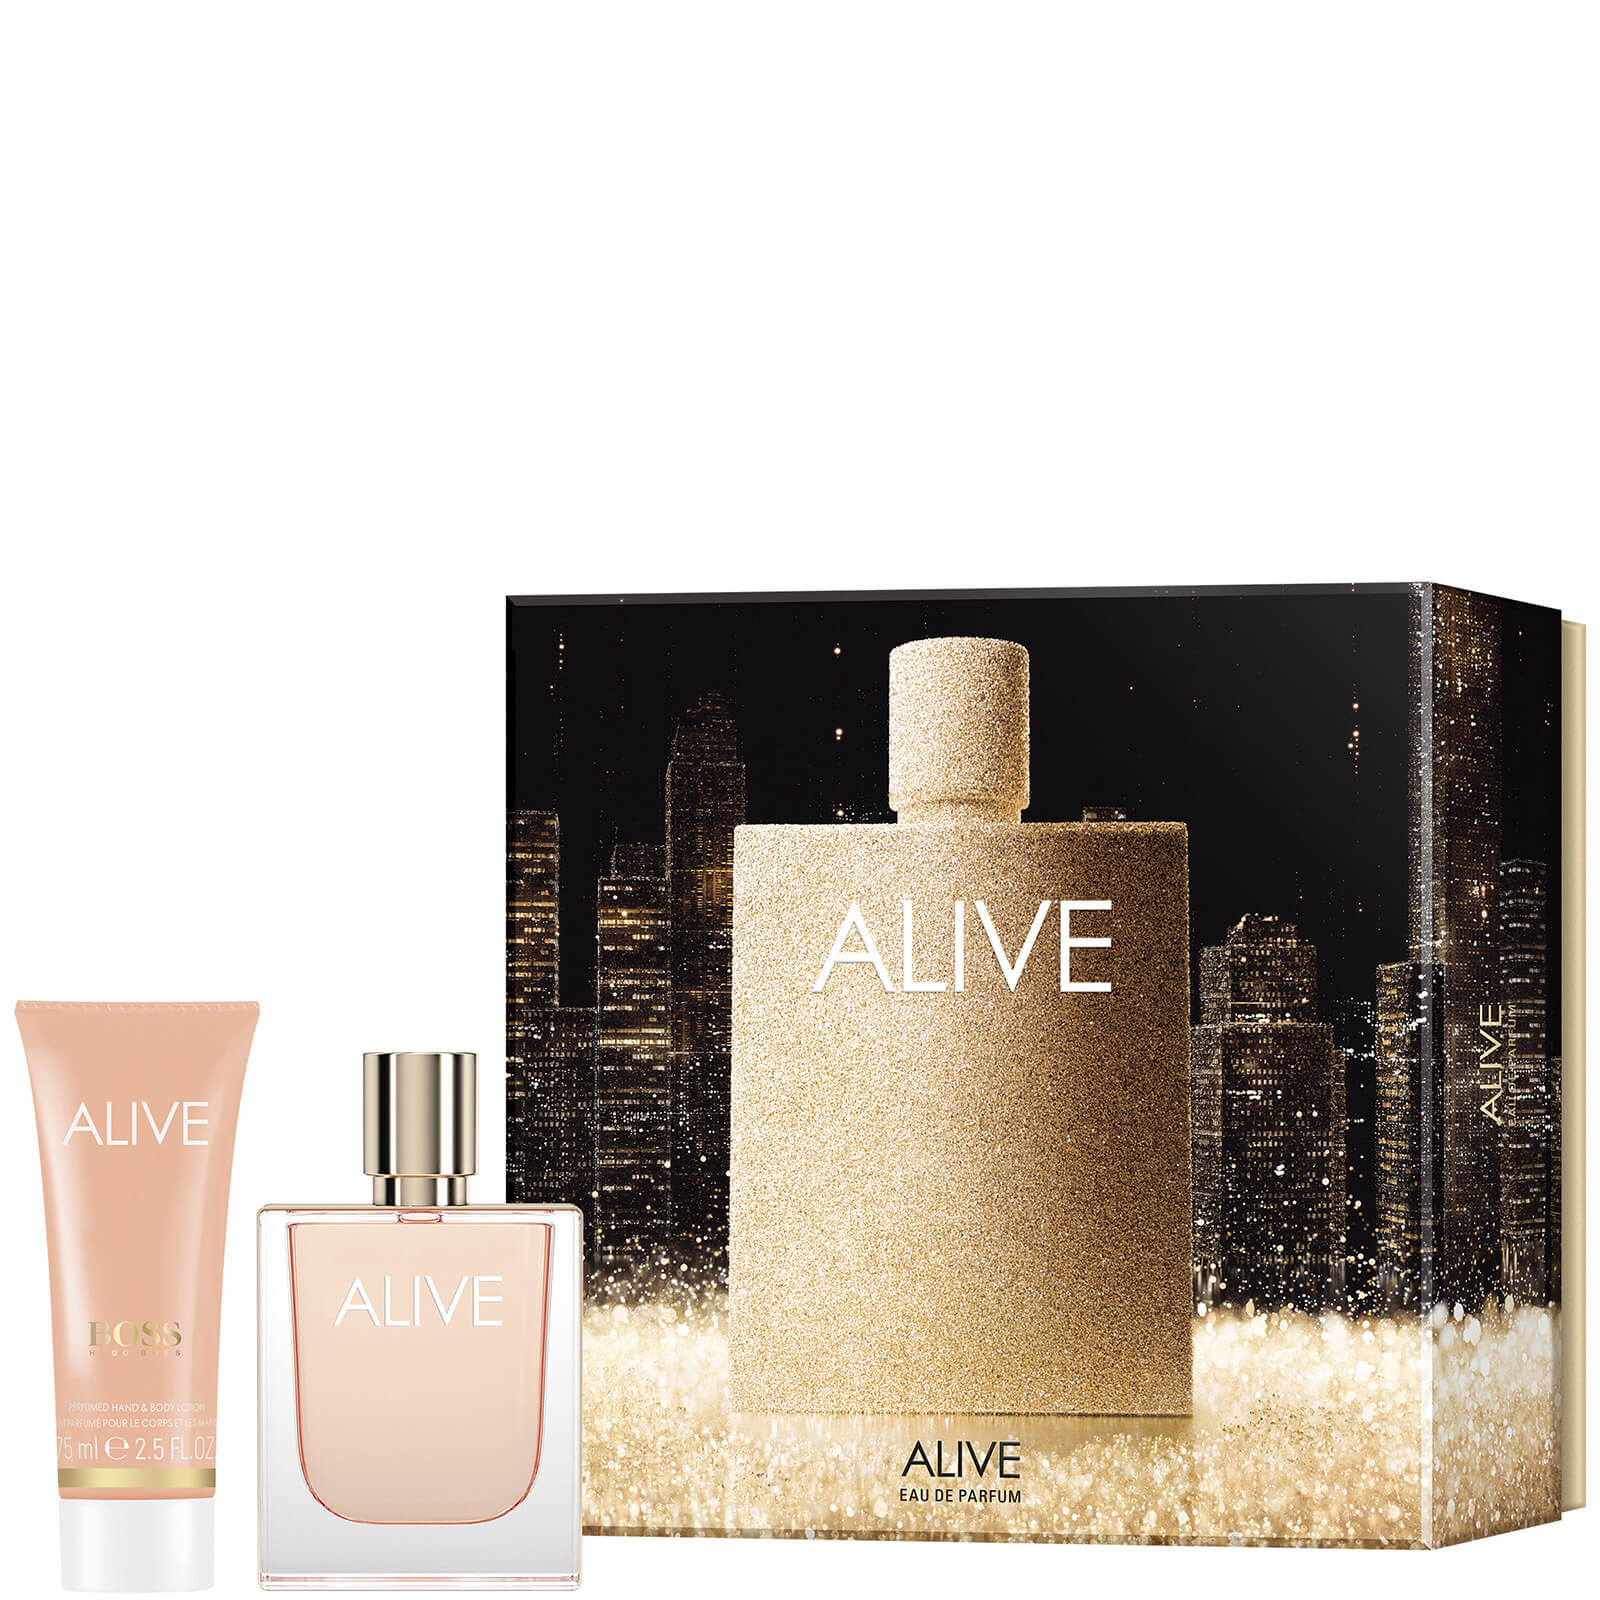 HUGO BOSS Alive for Her Eau de Parfum 50ml Gift Set